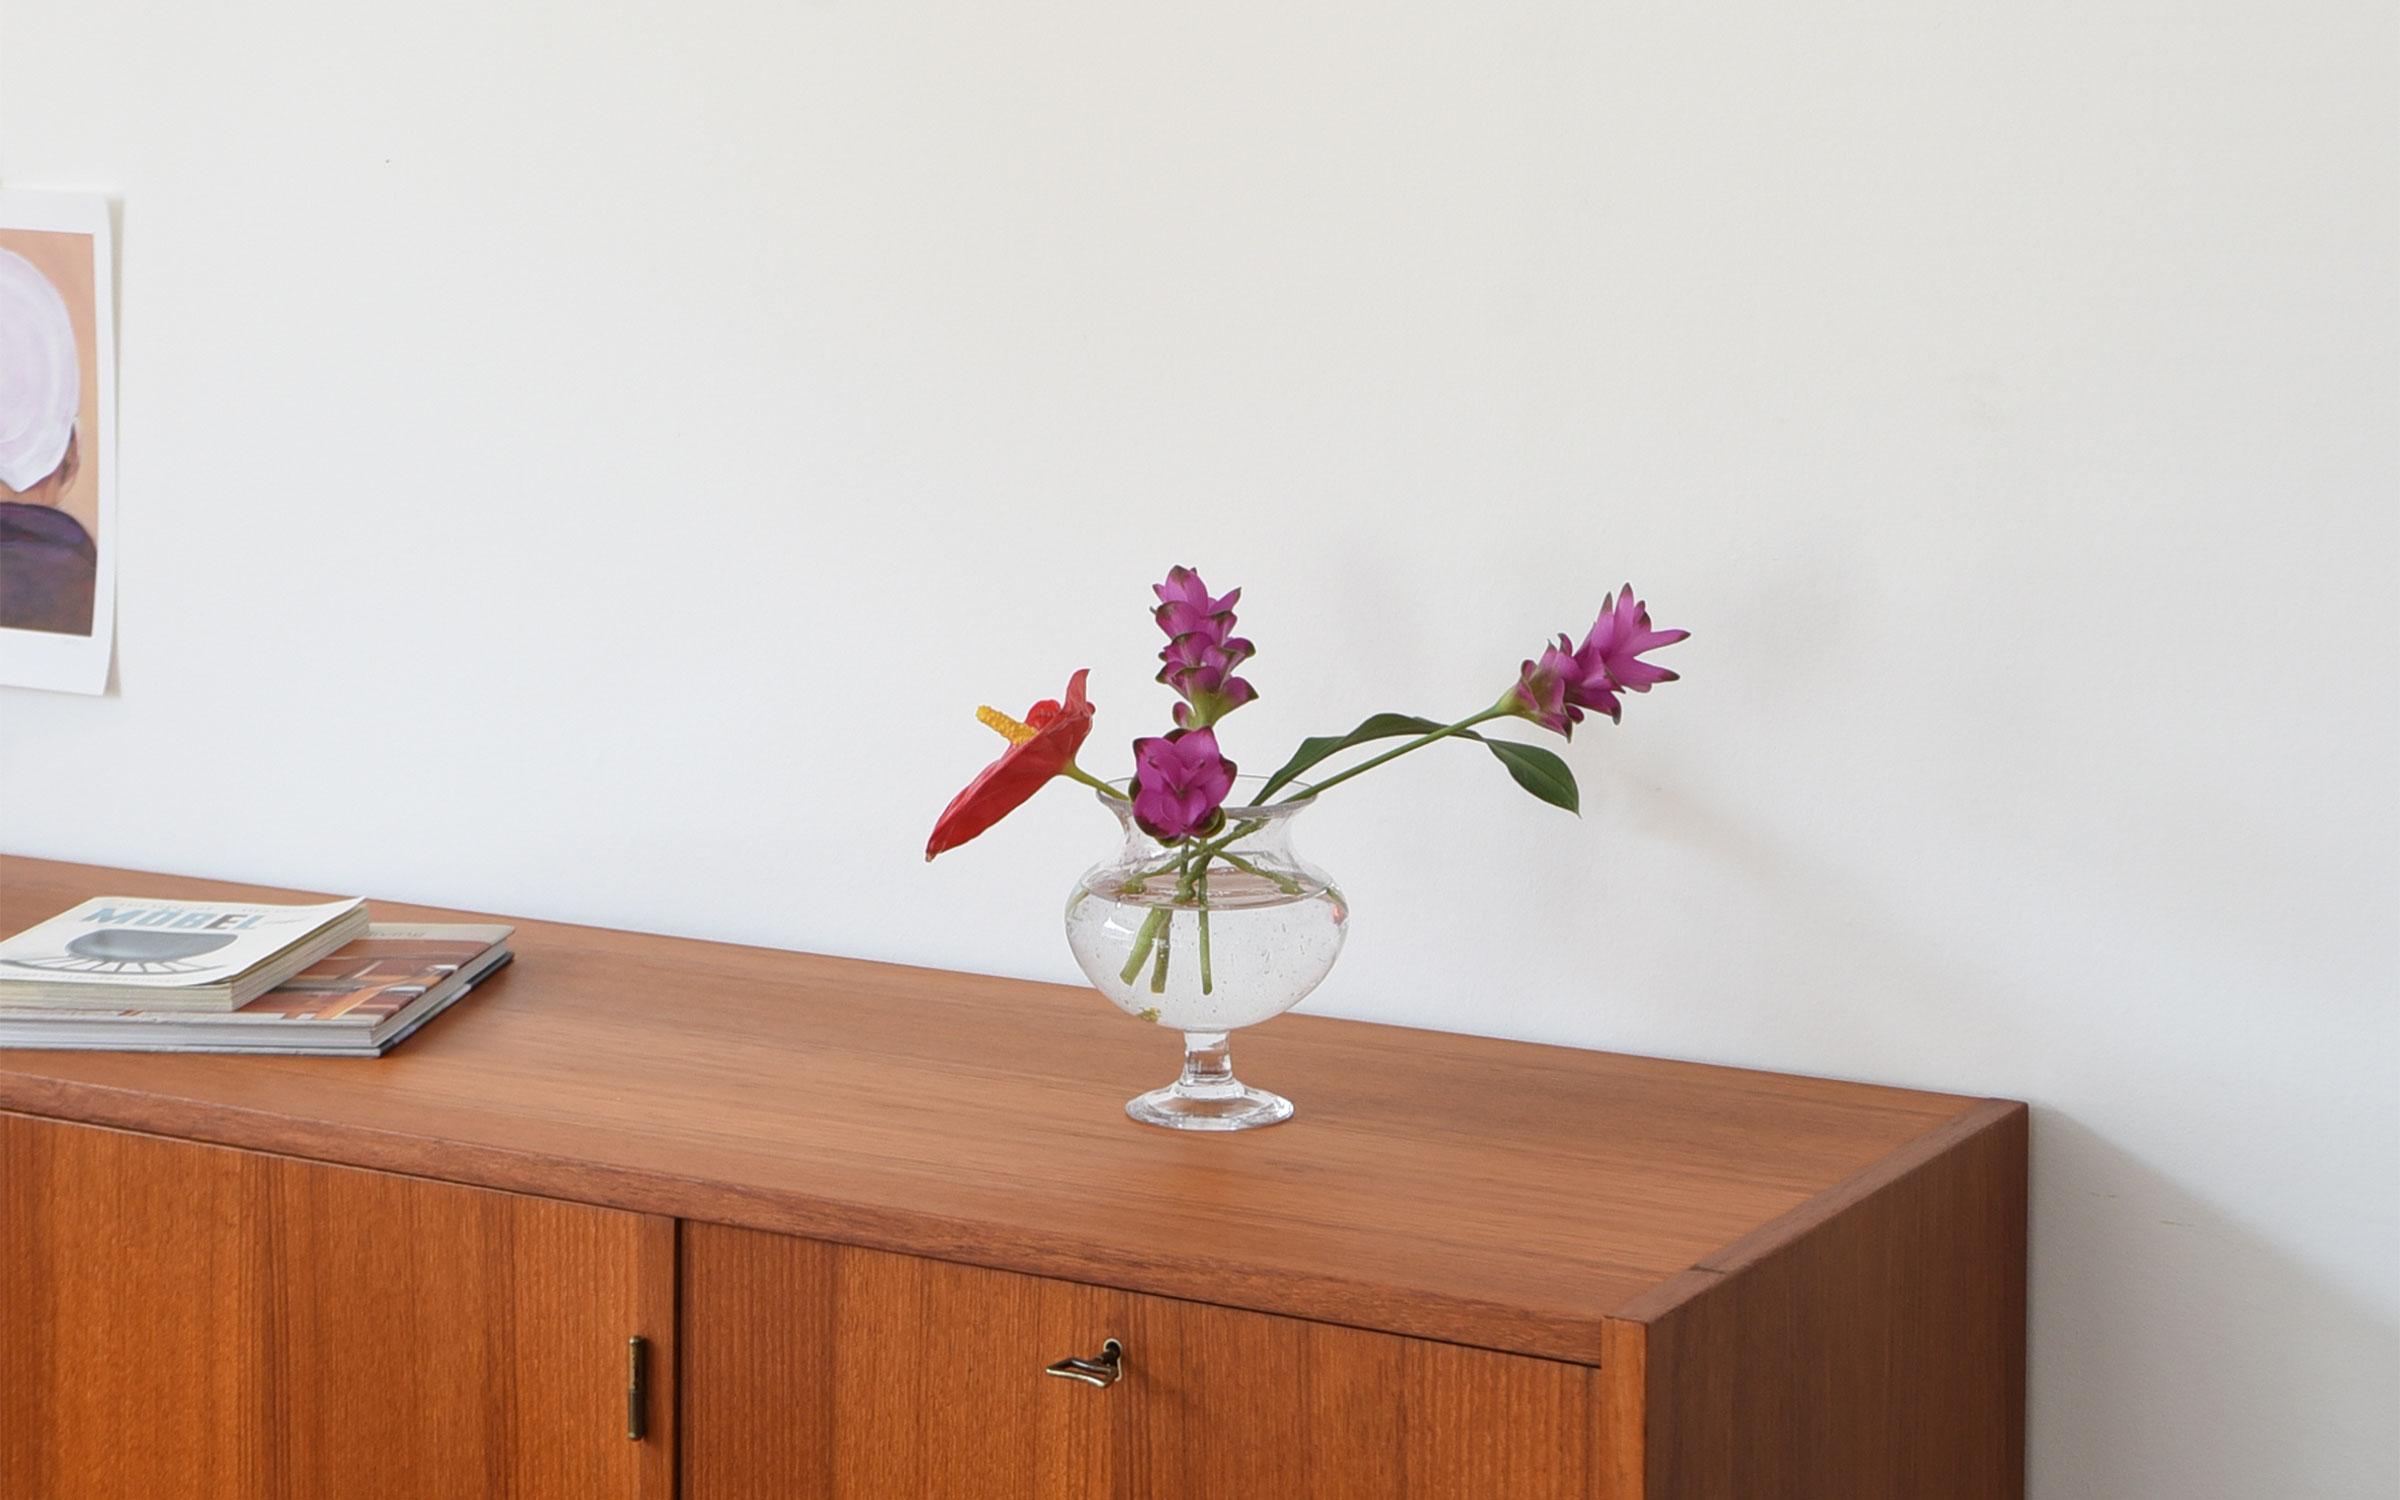 Erik Hoglund (エリック・ホグラン)Clear Goblet 花瓶 透明 クリア